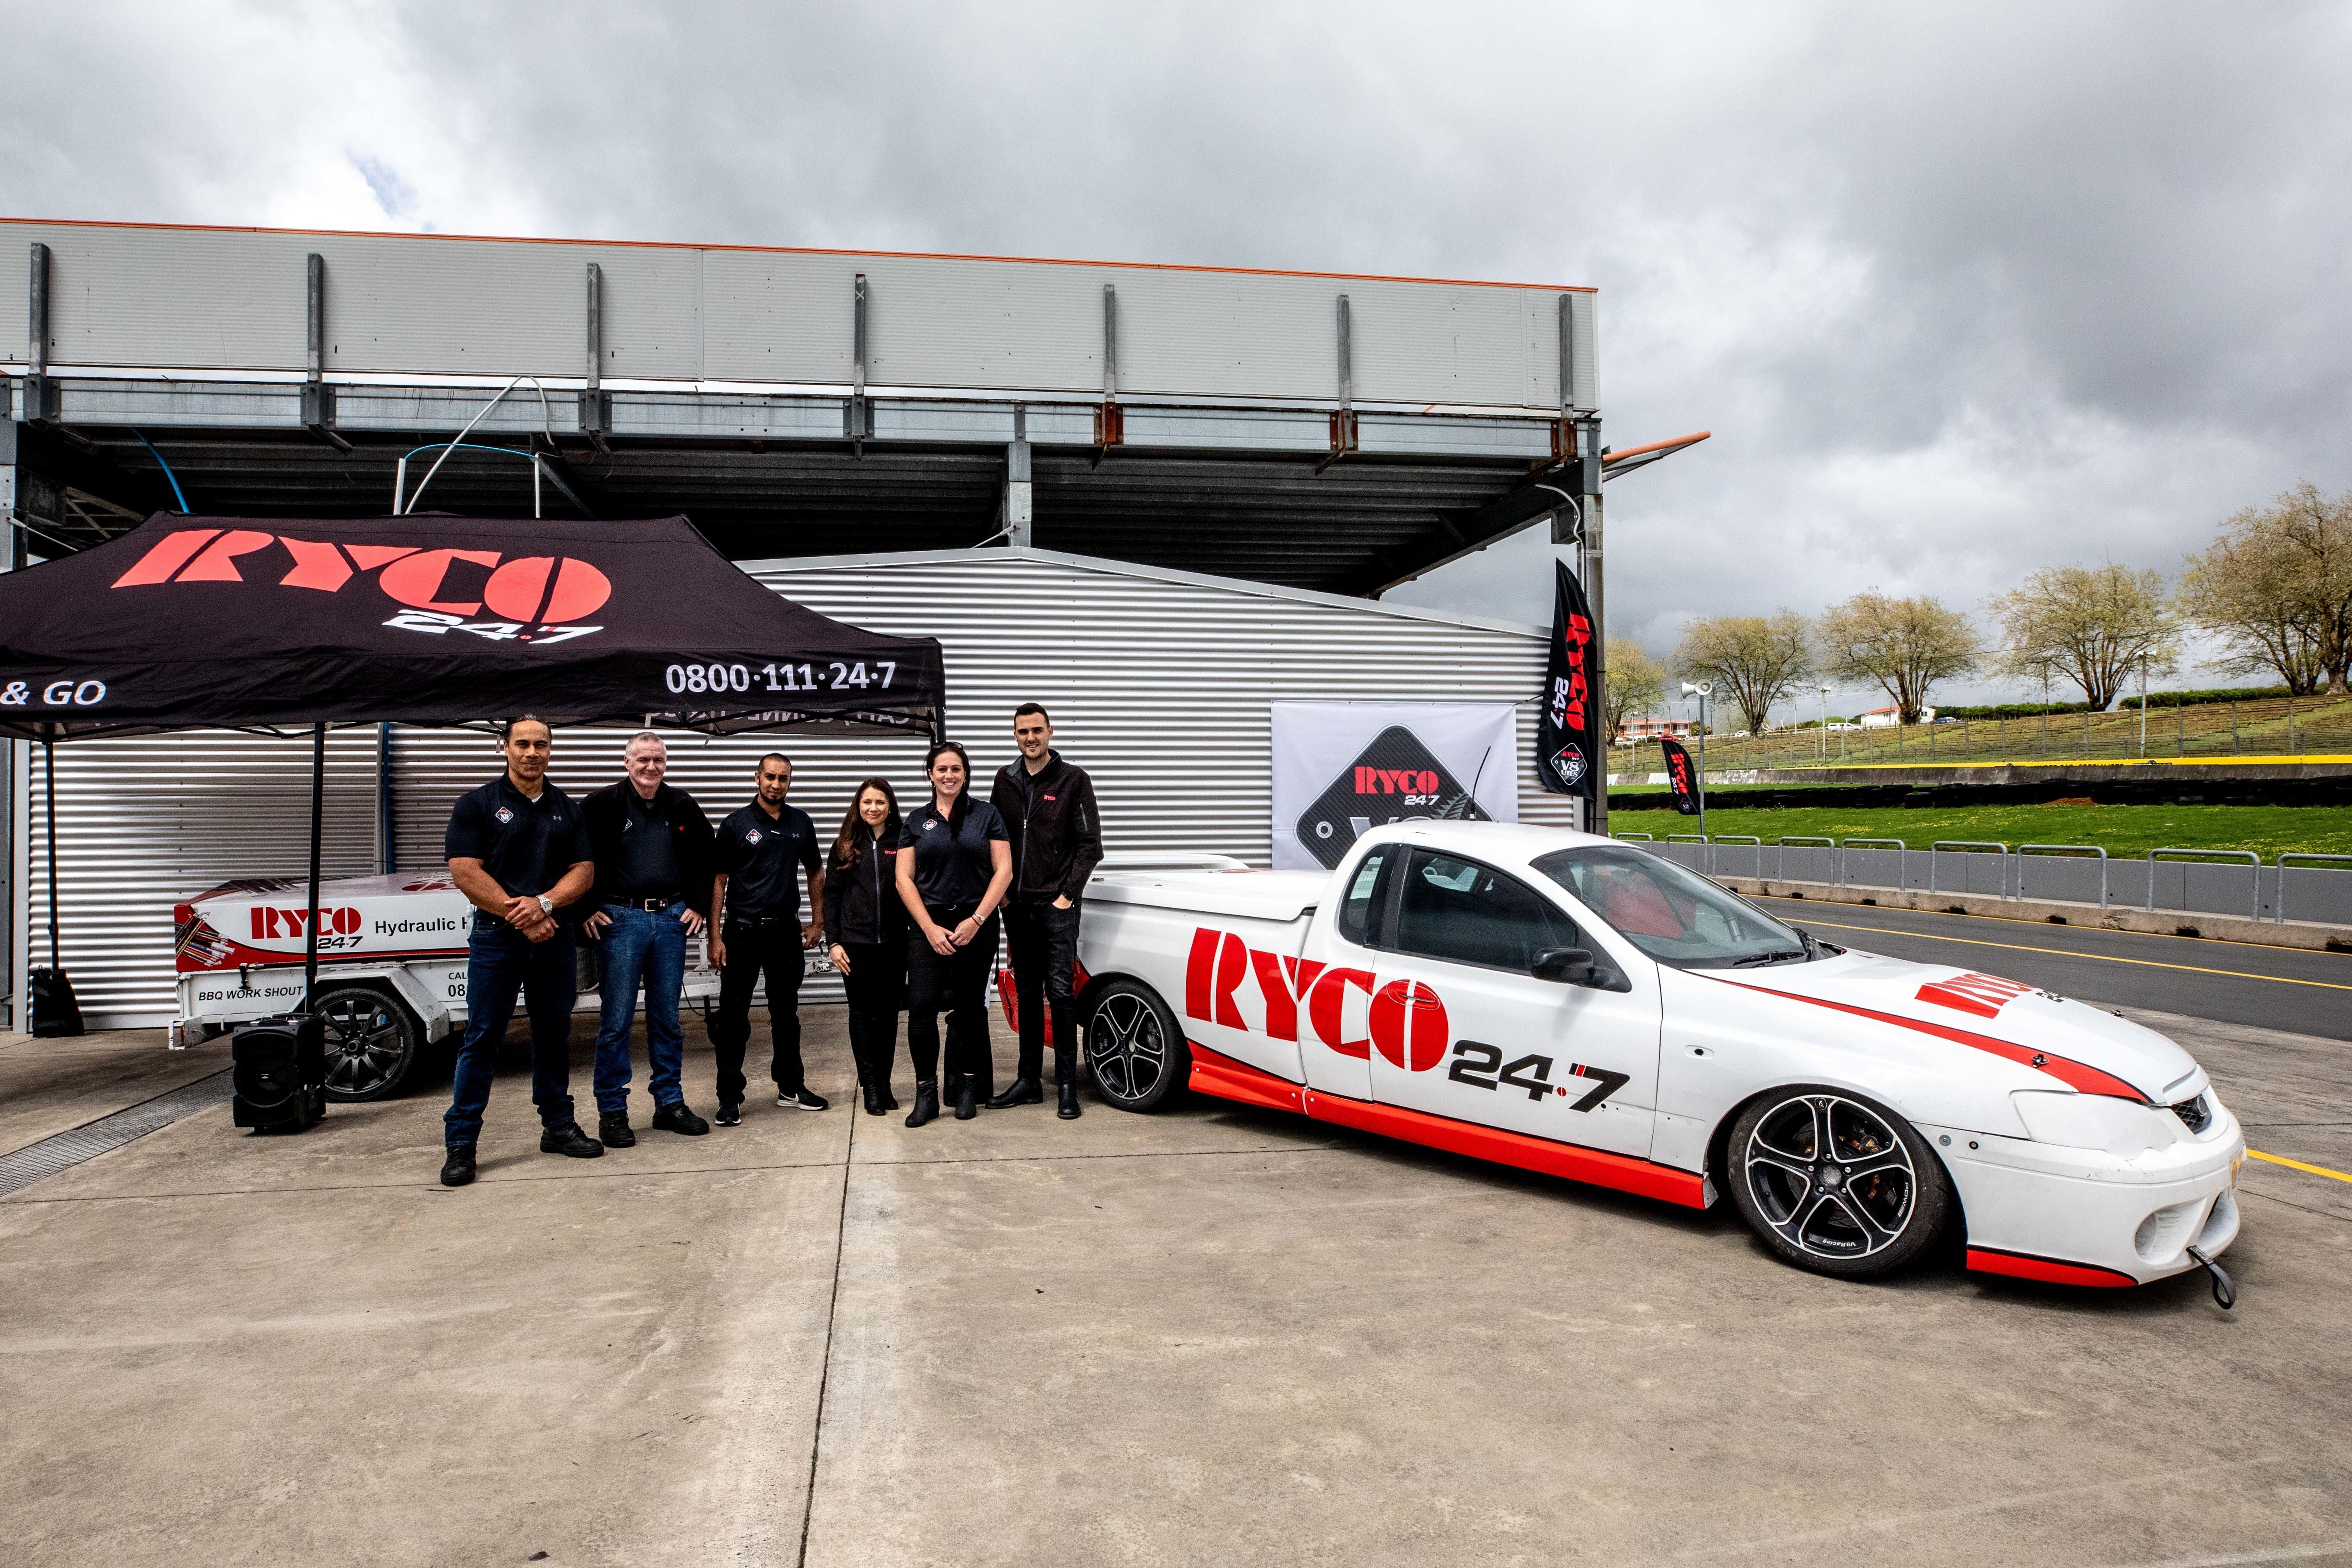 RYCO Racing team